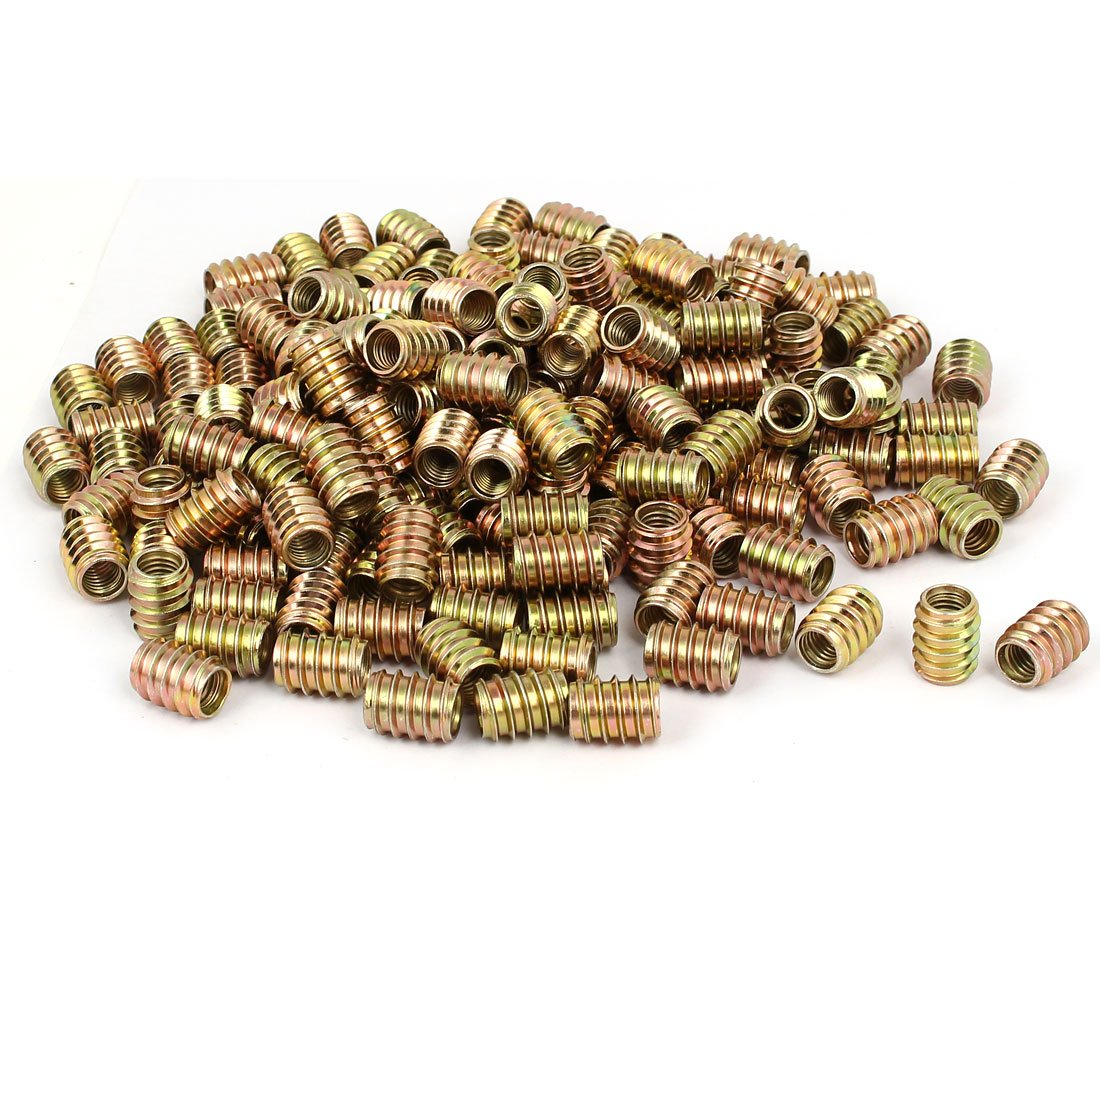 uxcell M8 x 17mm Wood Furniture Insert Screw E-Nut Bronze Tone 300pcs